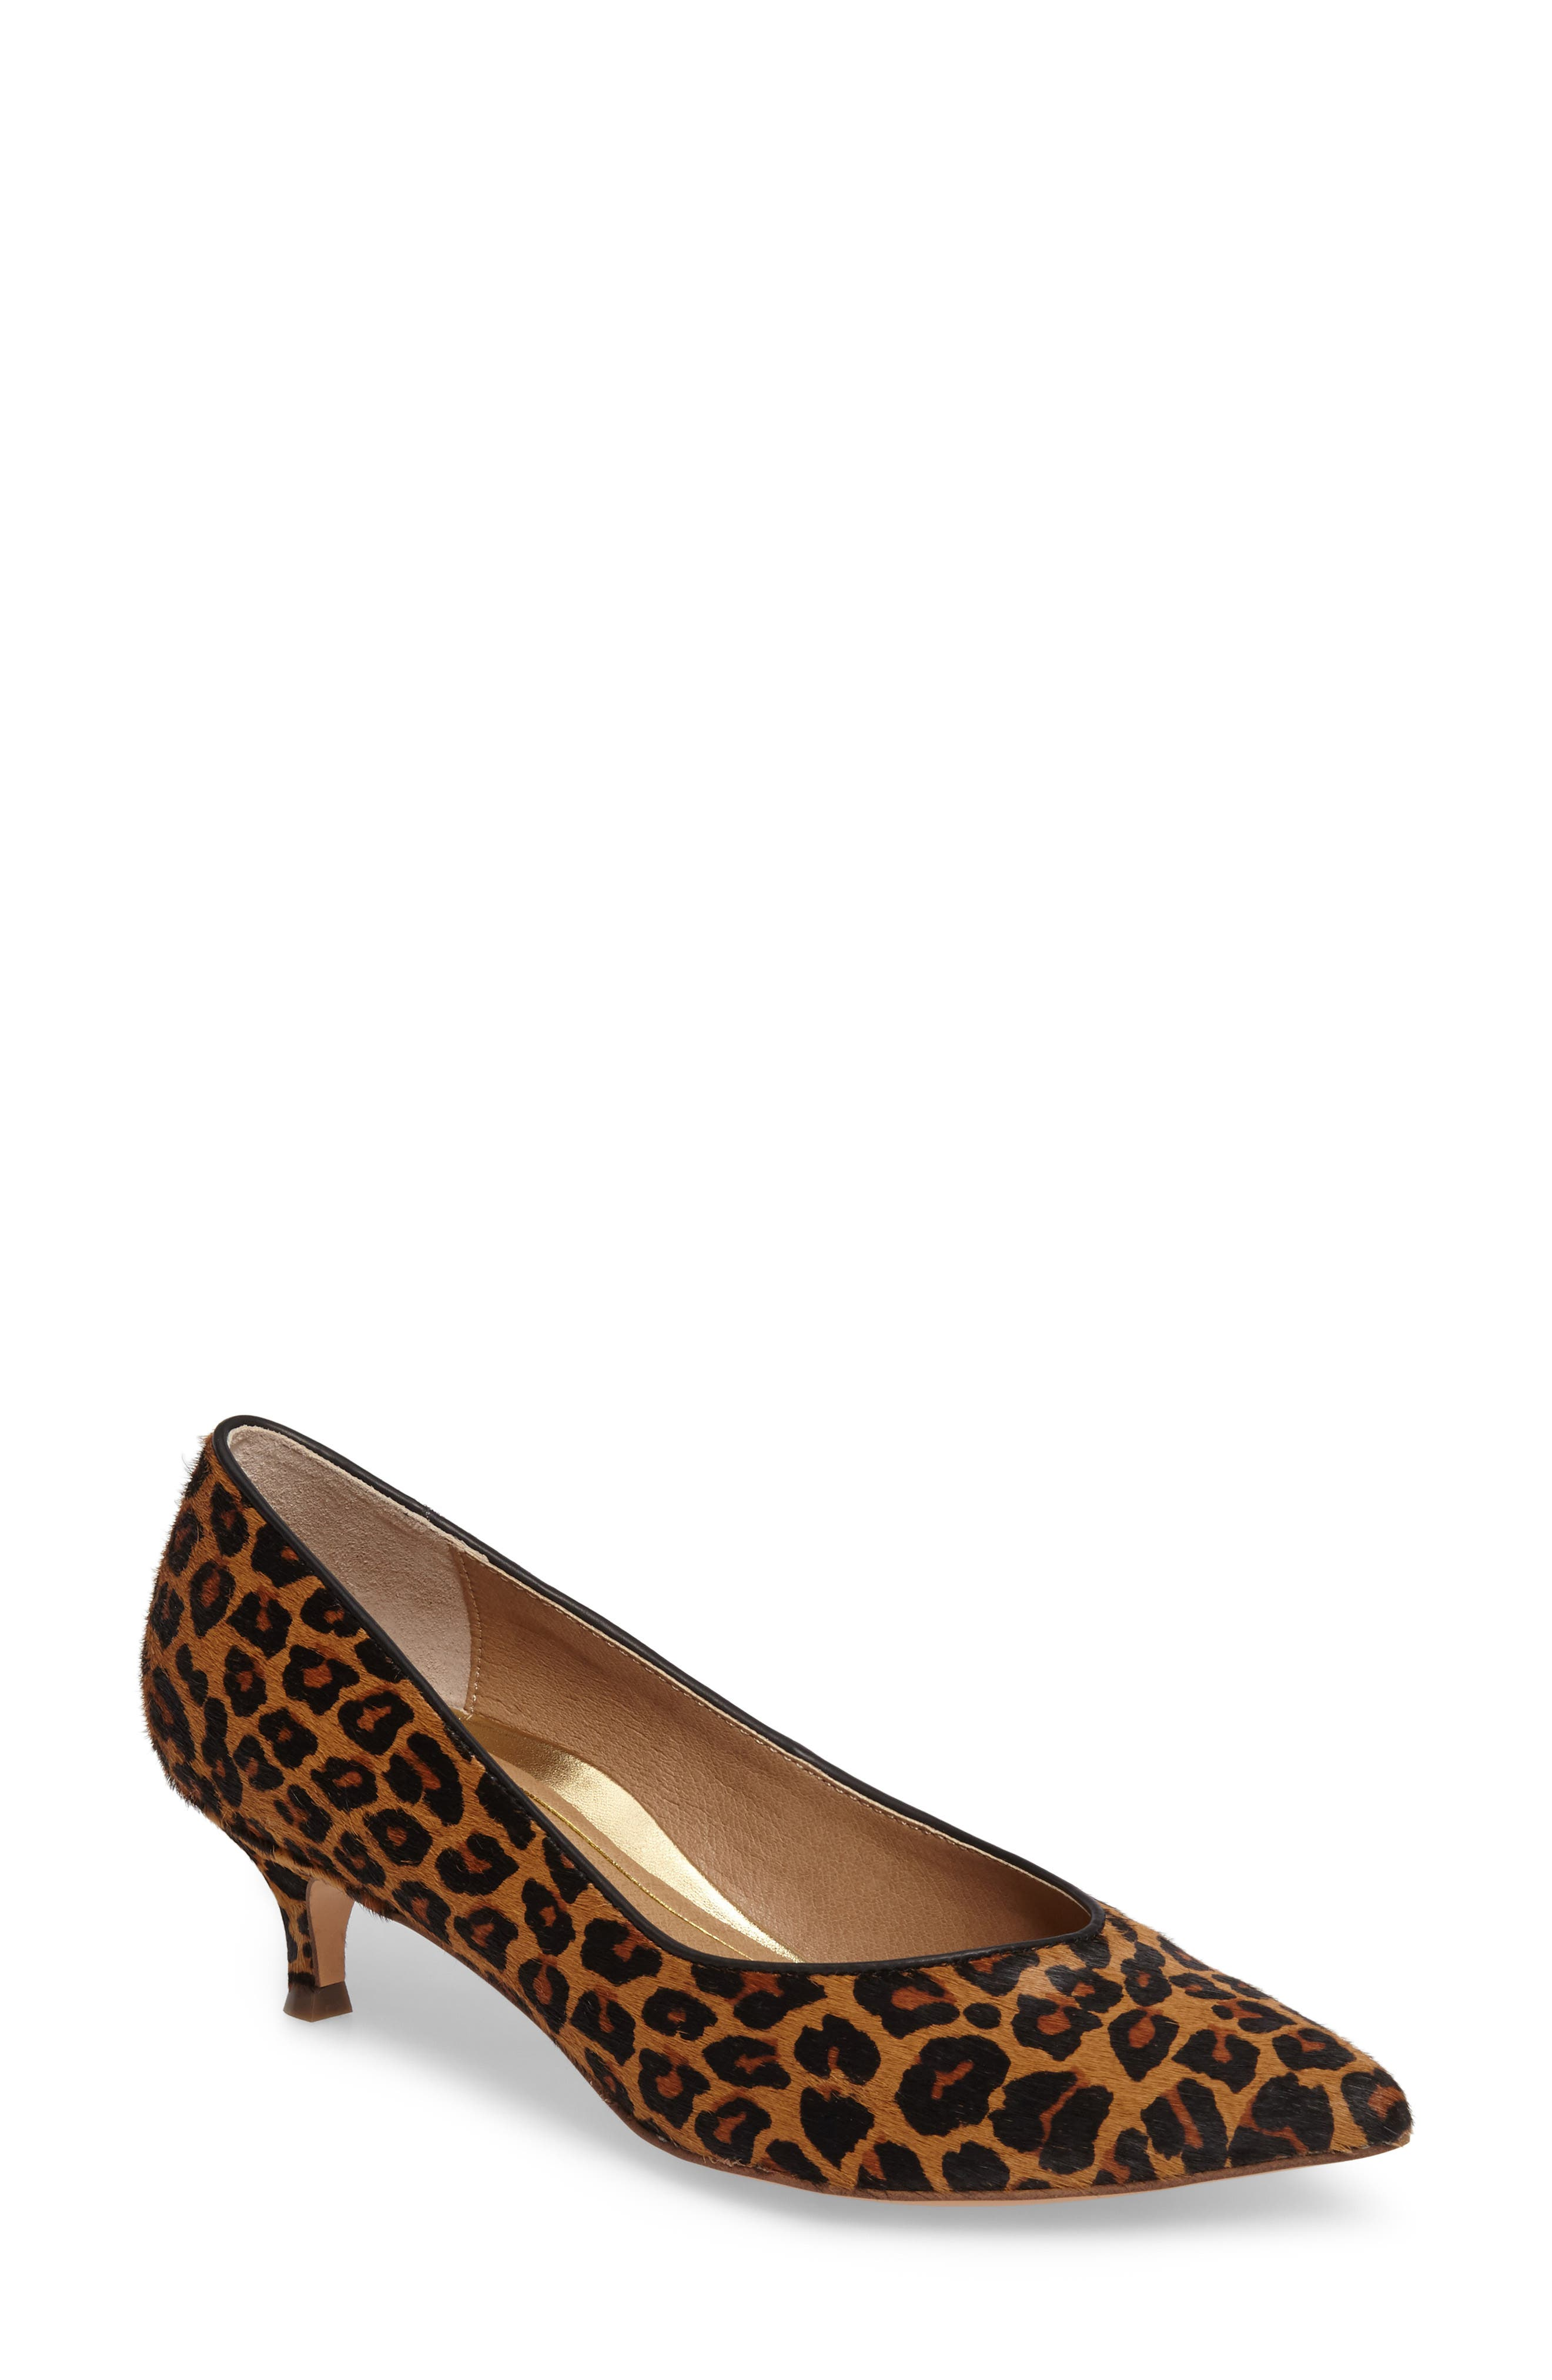 Vionic Josie Genuine Calf Hair Kitten Heel Pump (Women)